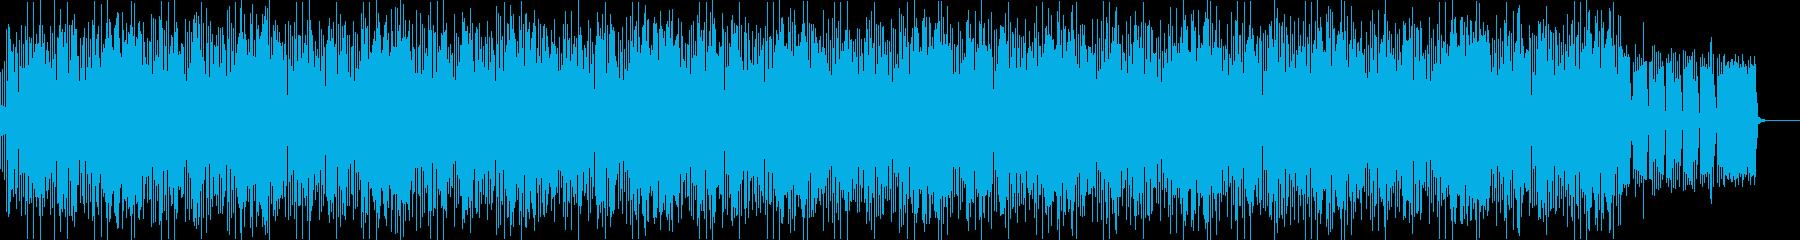 CM、企業VPFuture Bass cの再生済みの波形